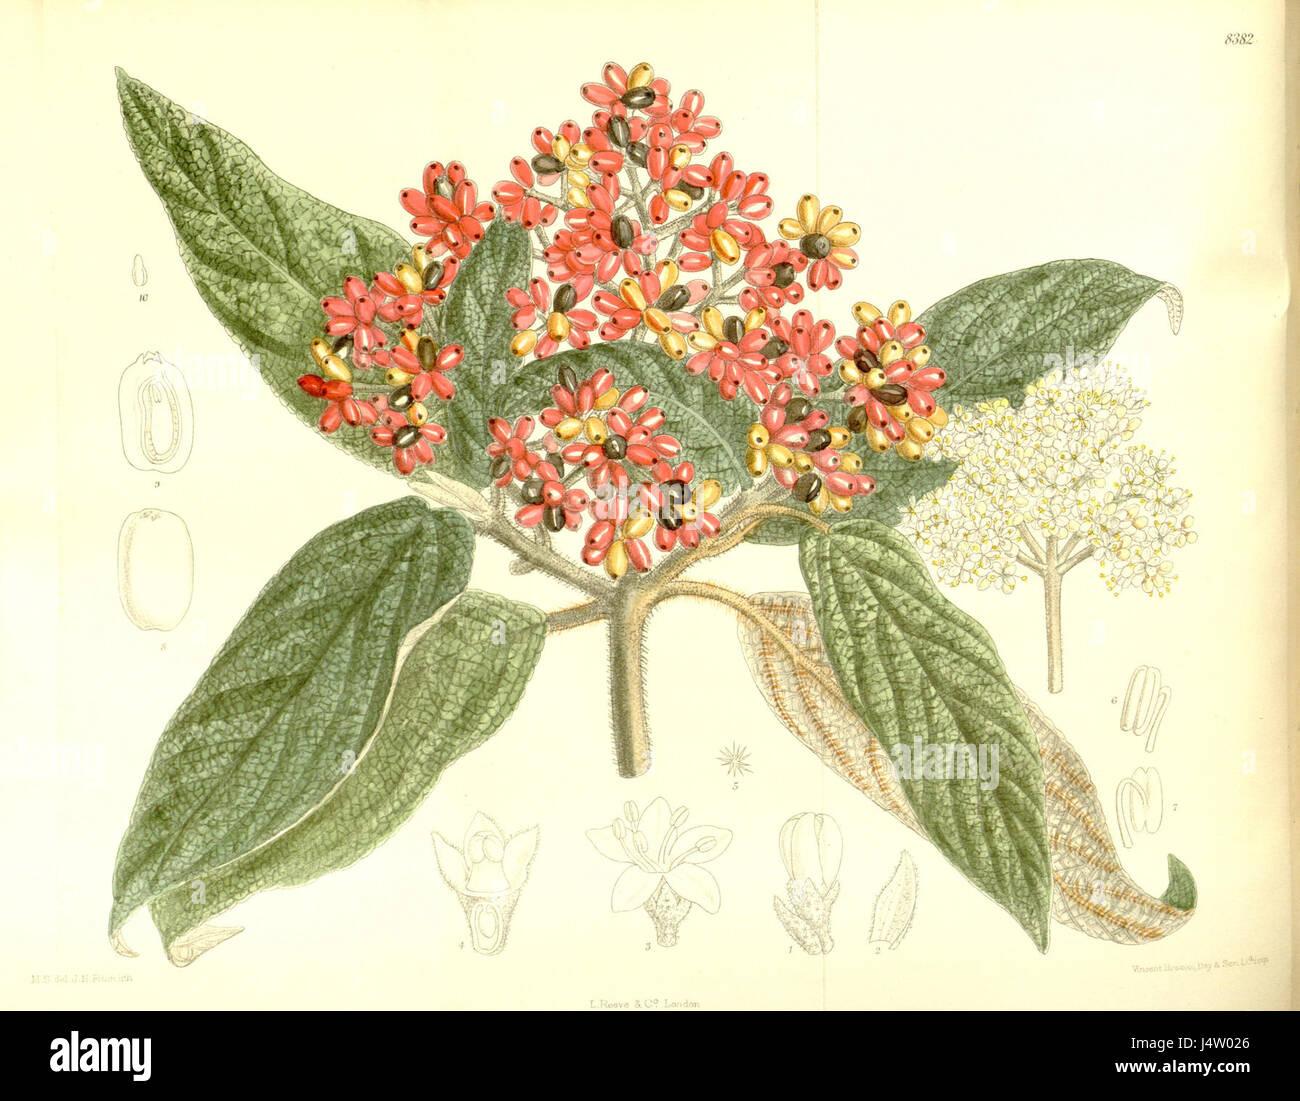 Viburnum rhytidophyllum 137 8382 - Stock Image